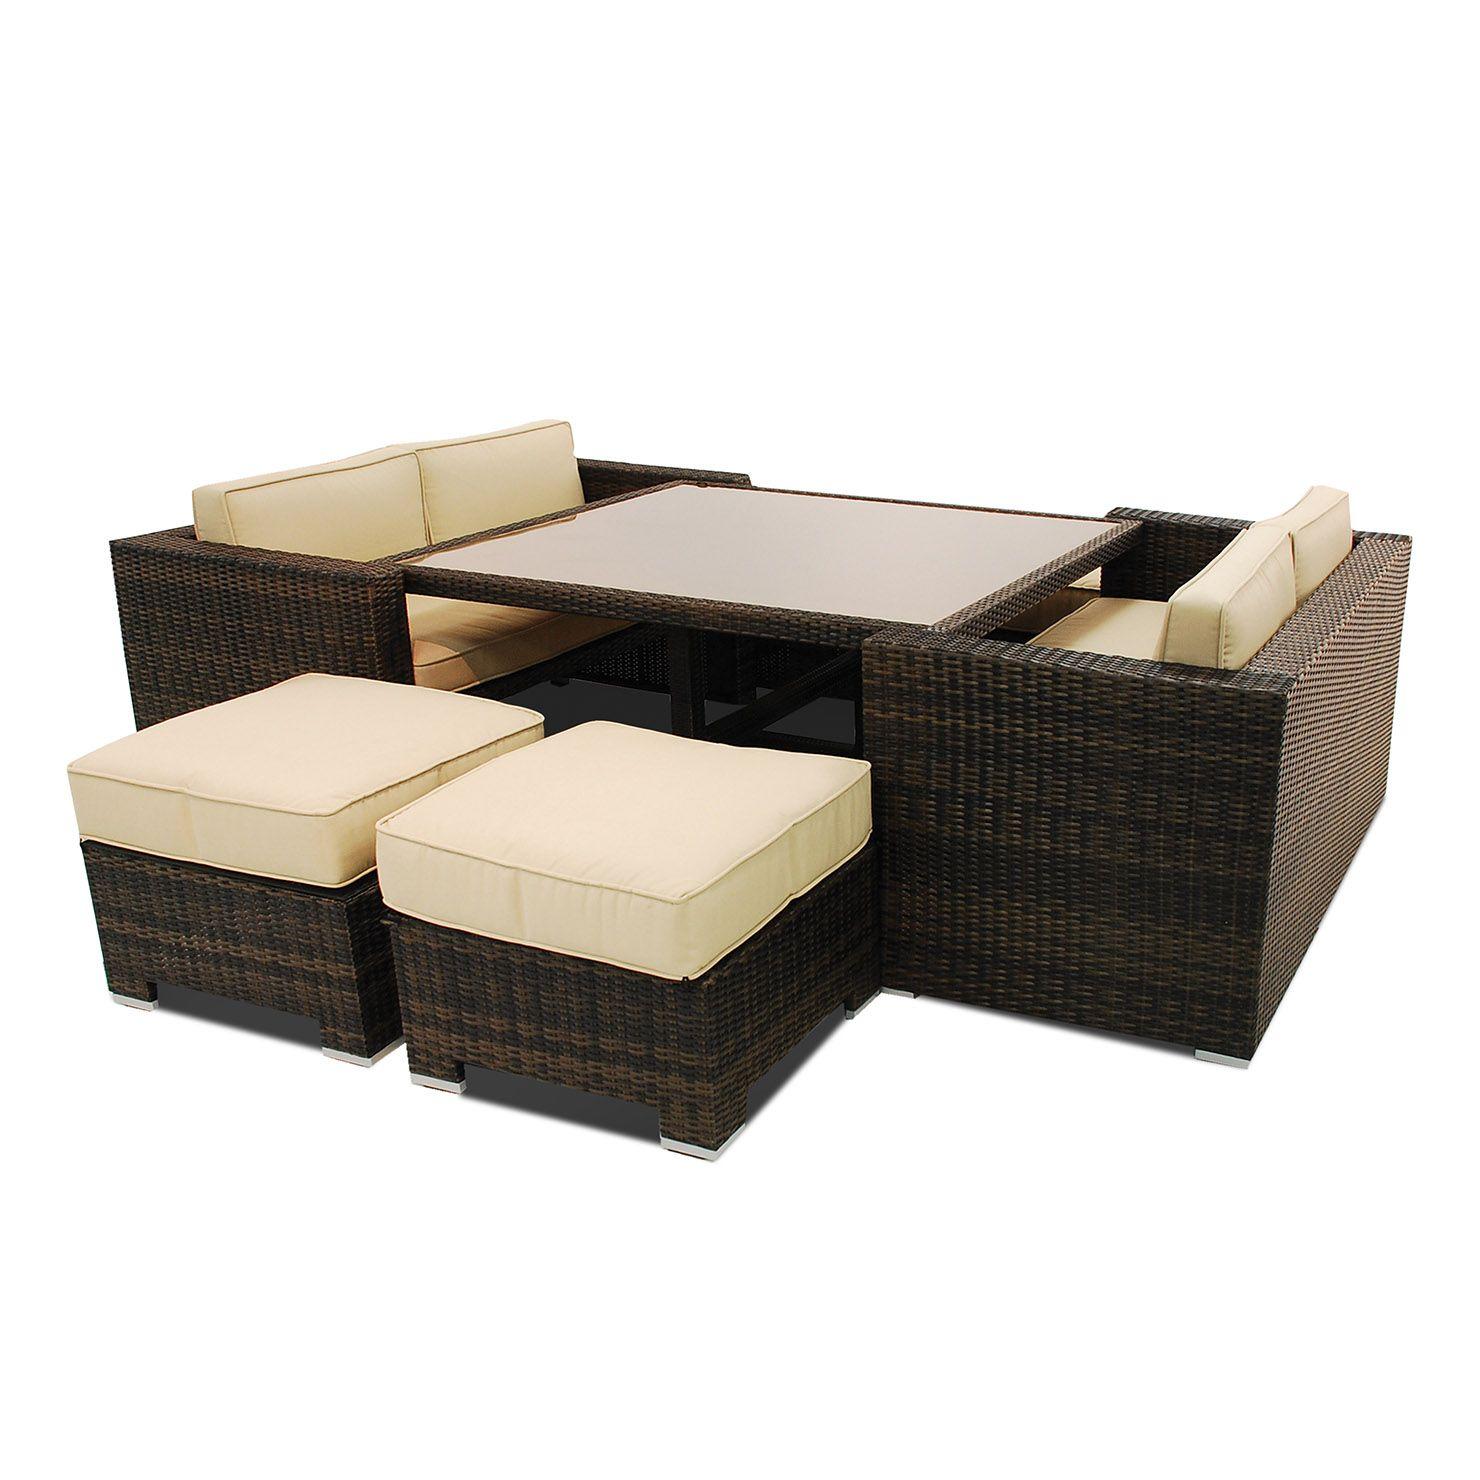 c35c257dedf7 Maze Rattan Cube Sofa Set   ACHICA 810   Storage   Outdoor furniture ...